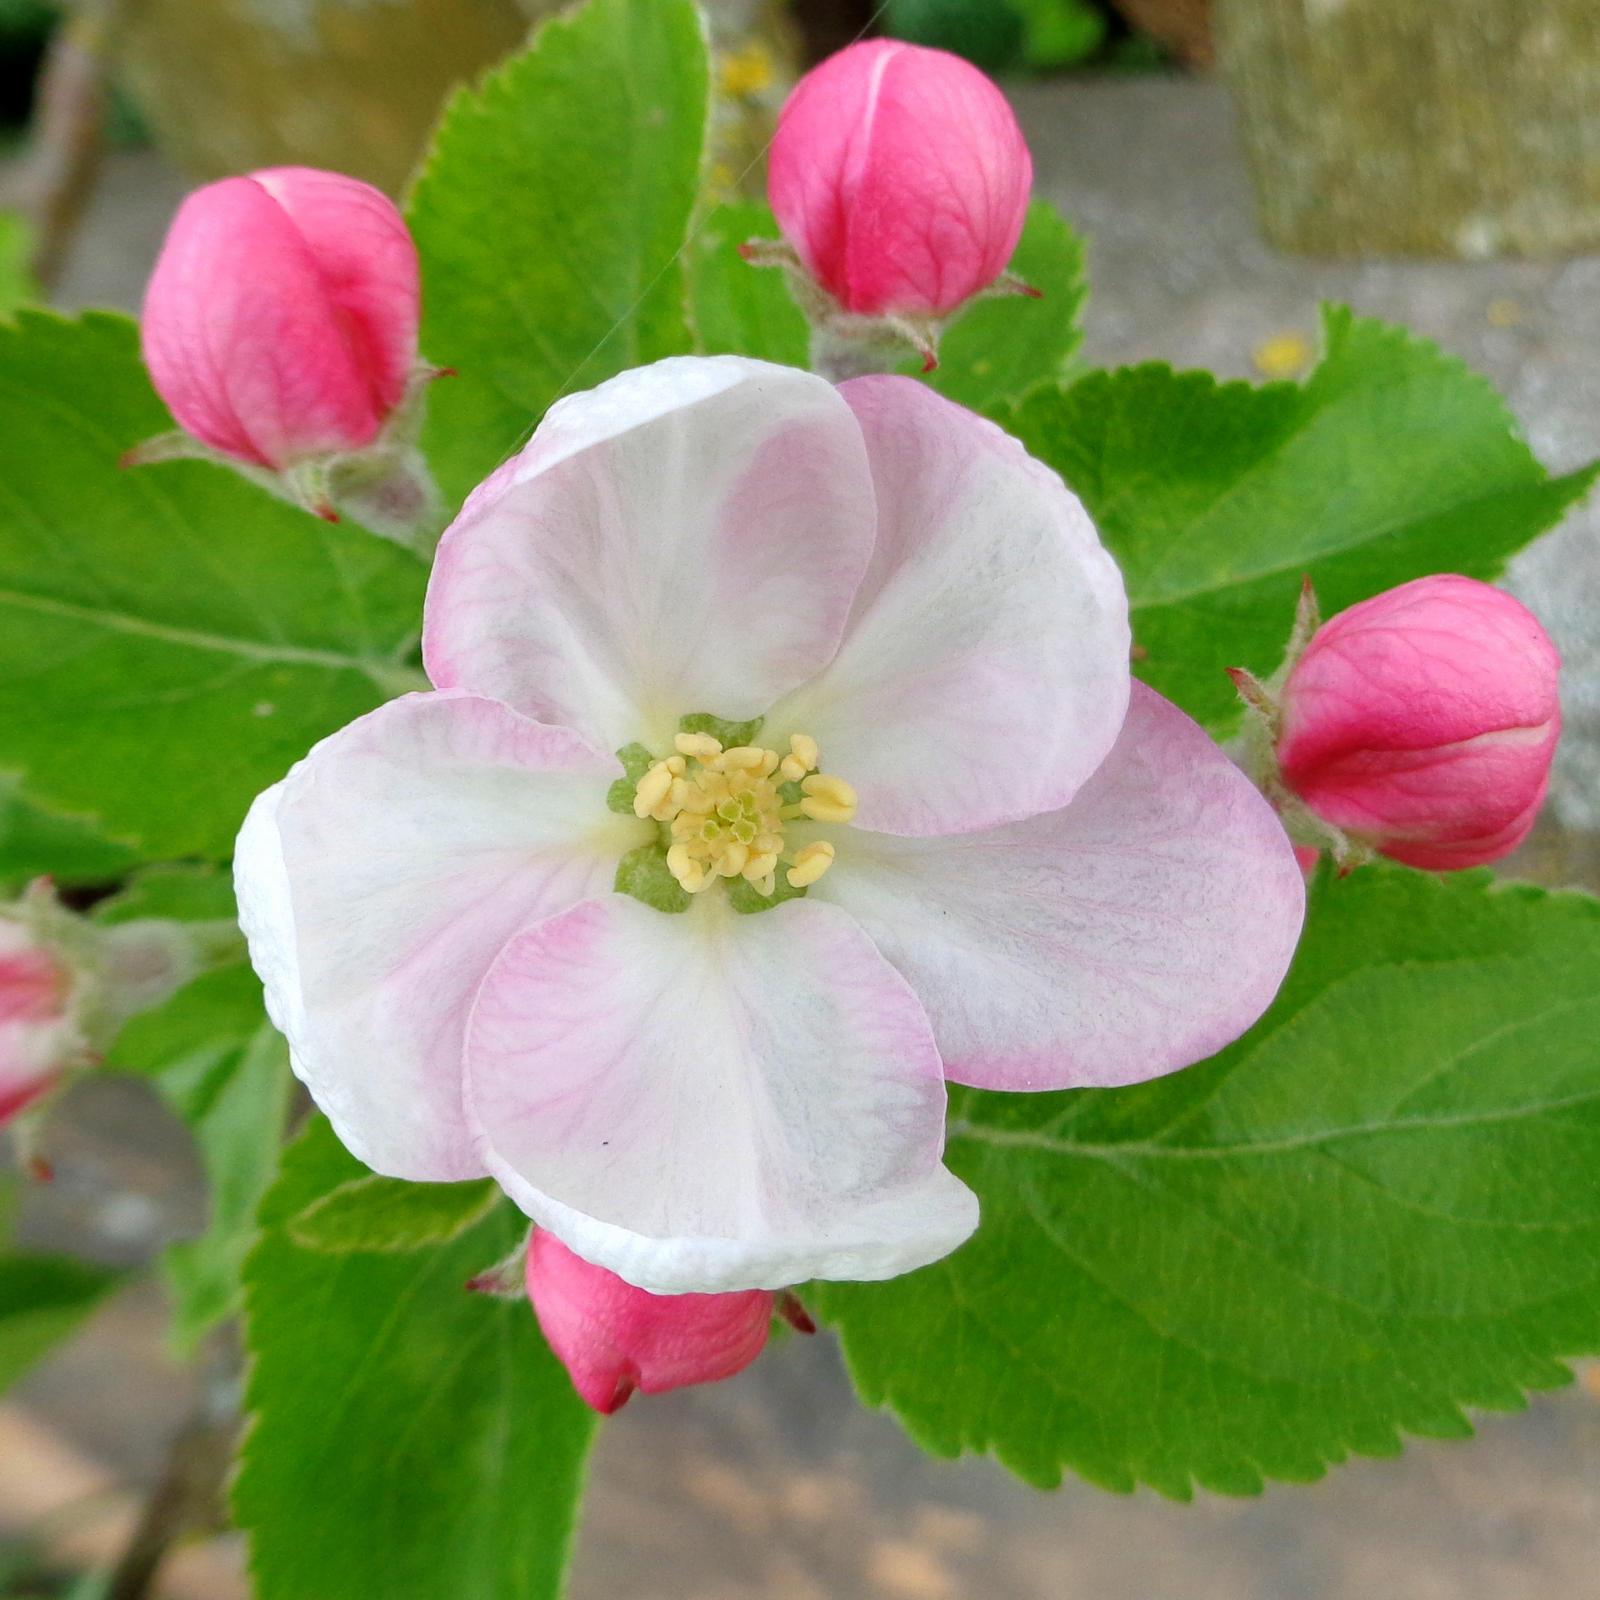 apple blossom #1 by Mittelfranke